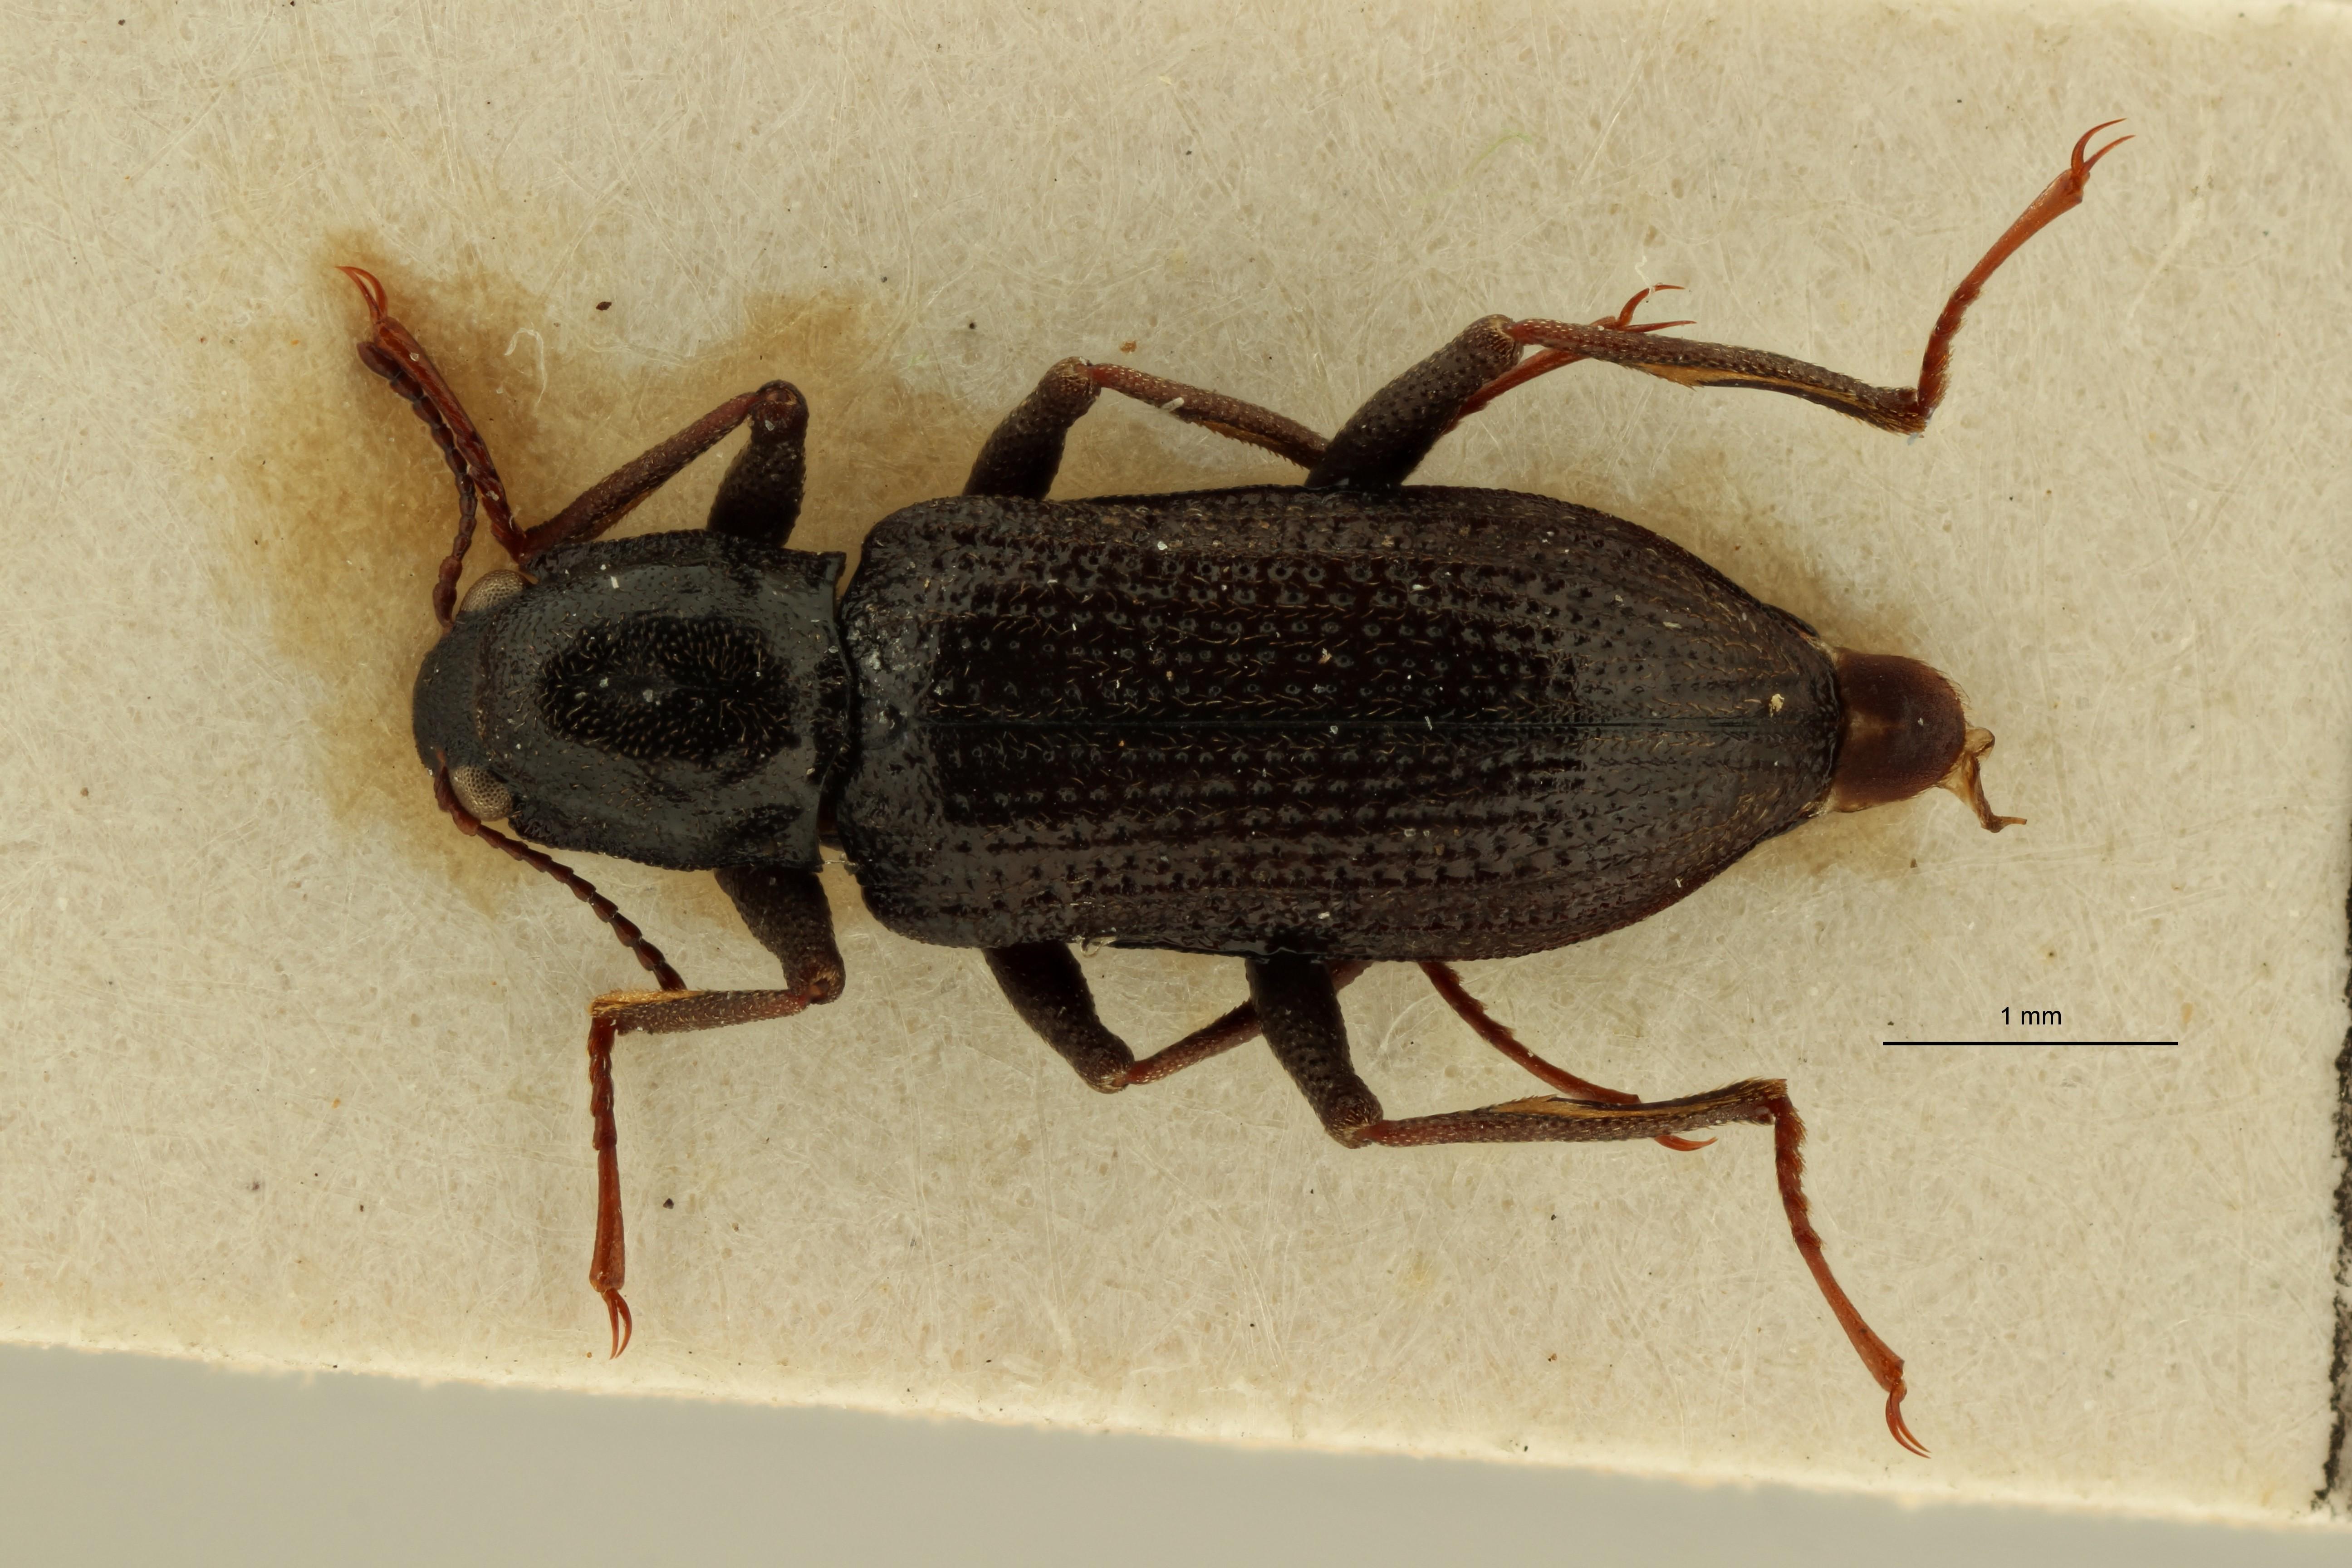 Cylloepus macrelmoides t M D ZS PMax Scaled.jpeg